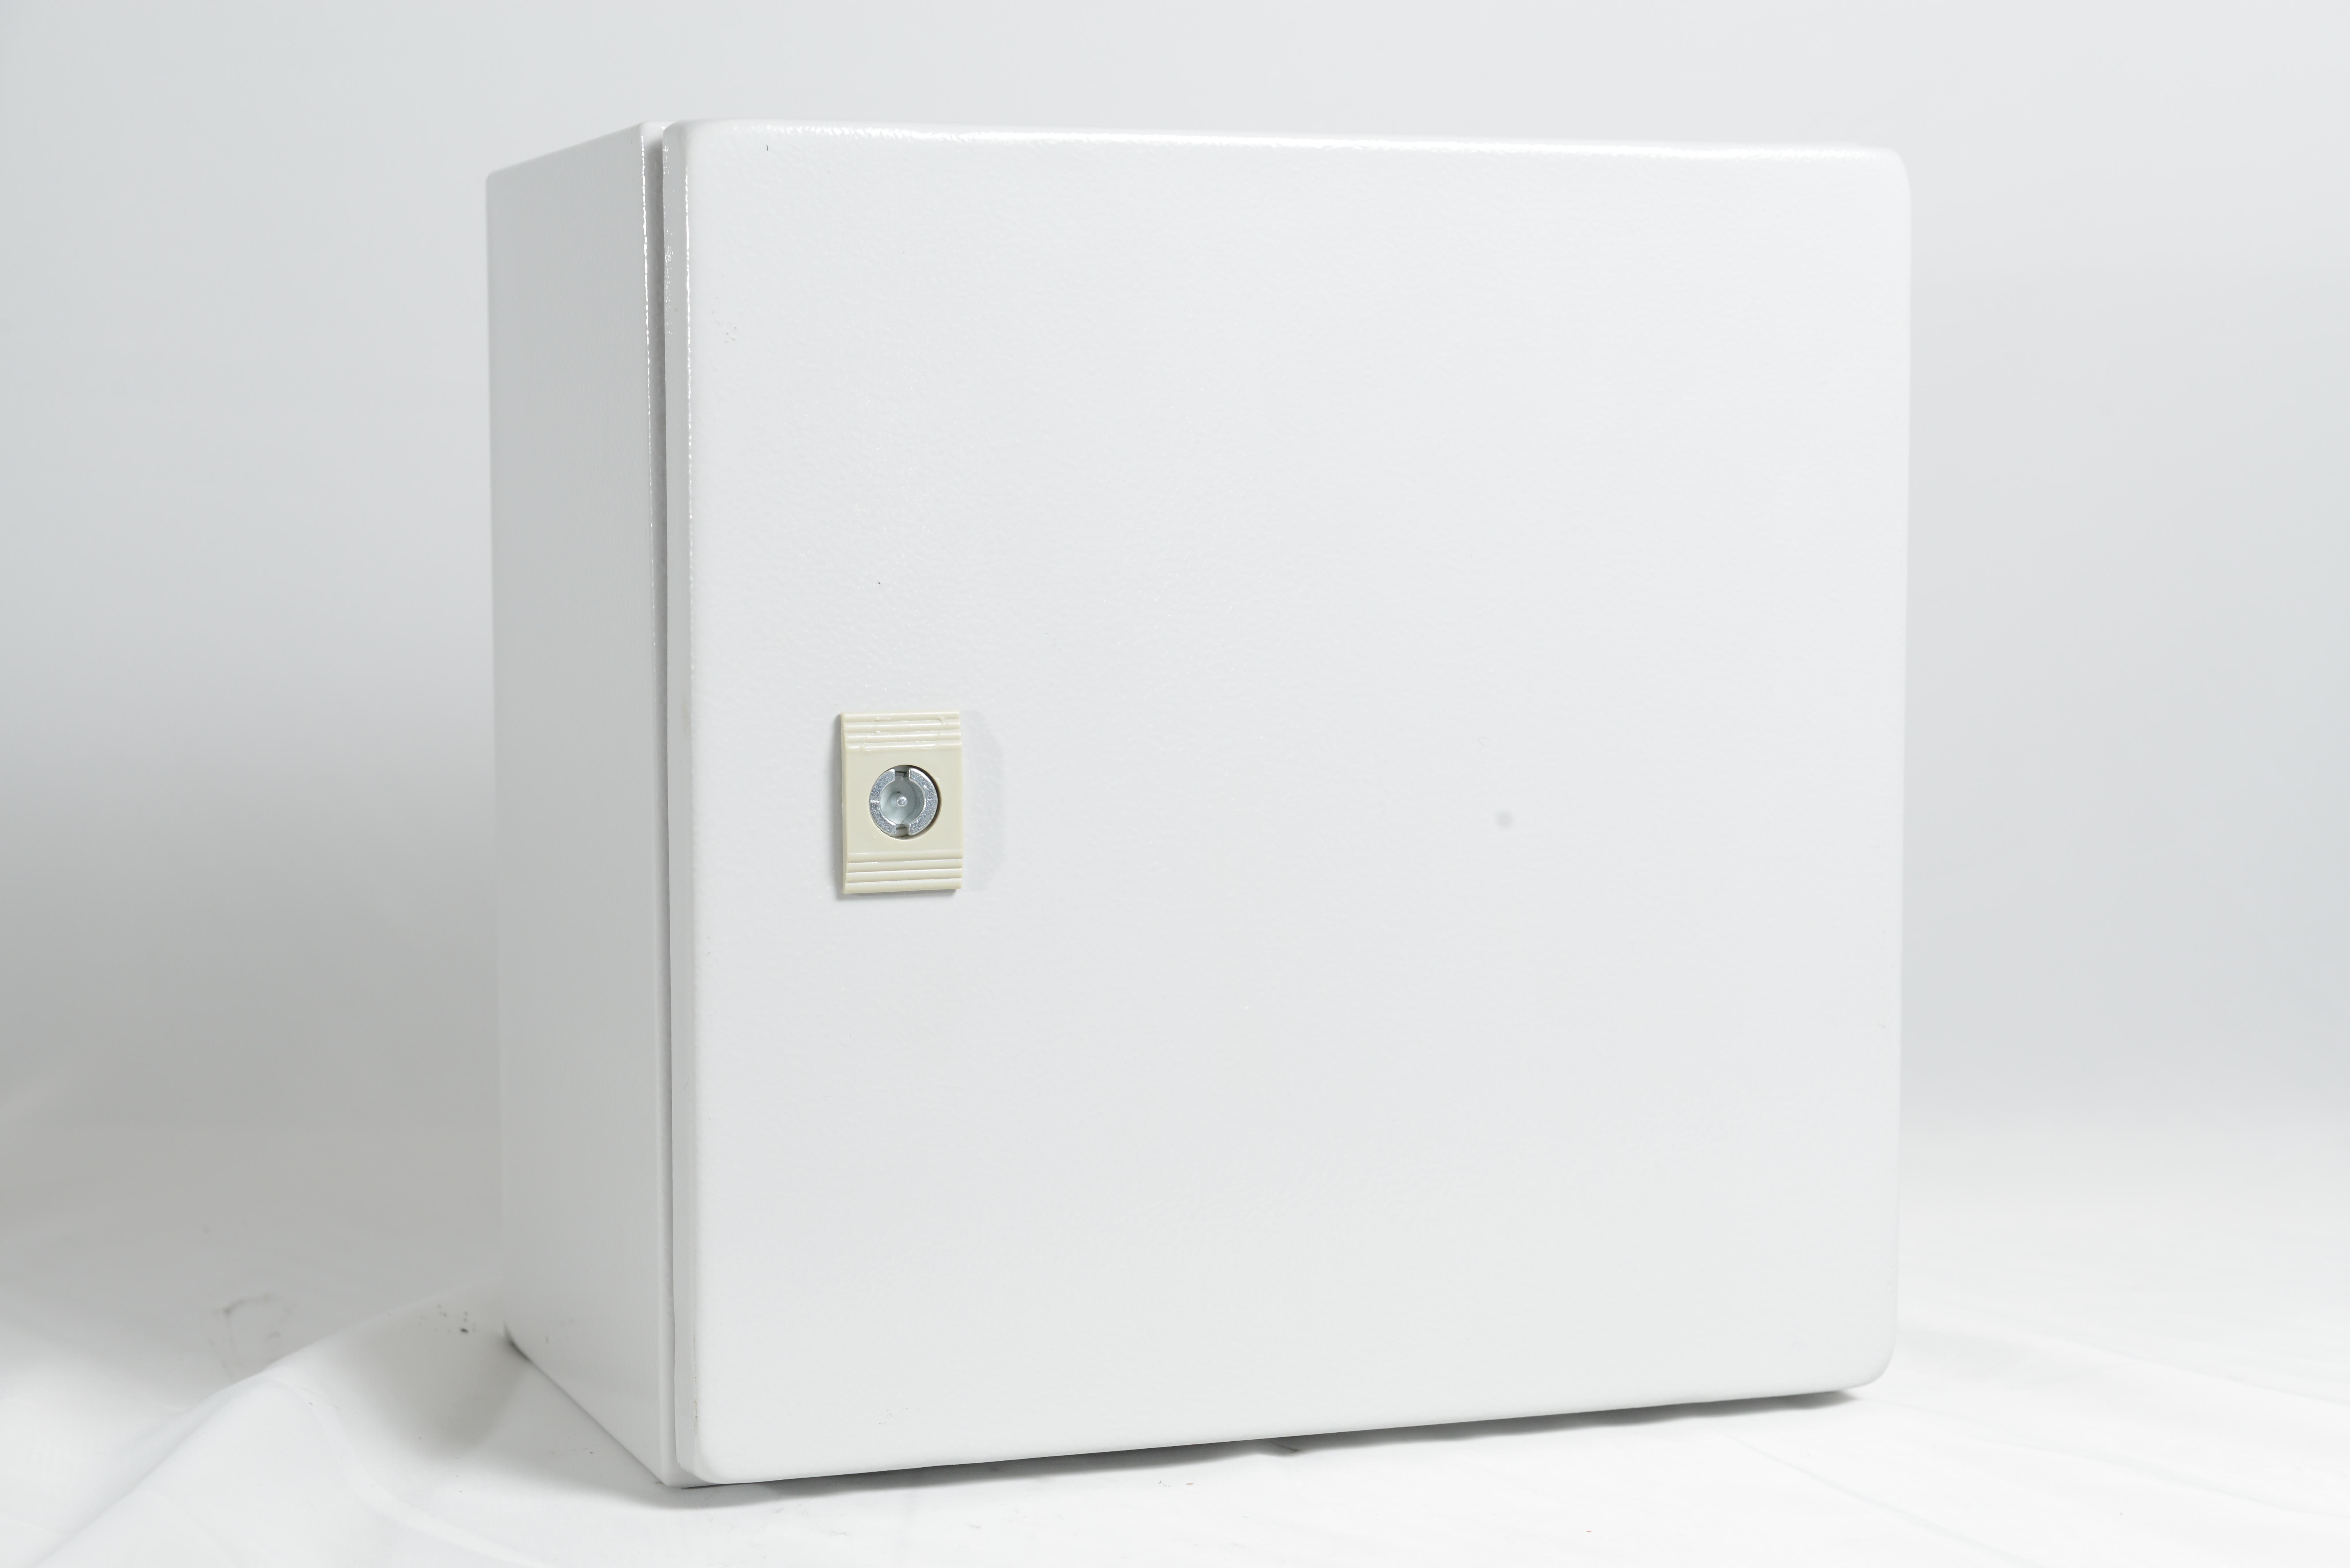 RCG Metal Enclosure 500x400x300mm - Wall mounting